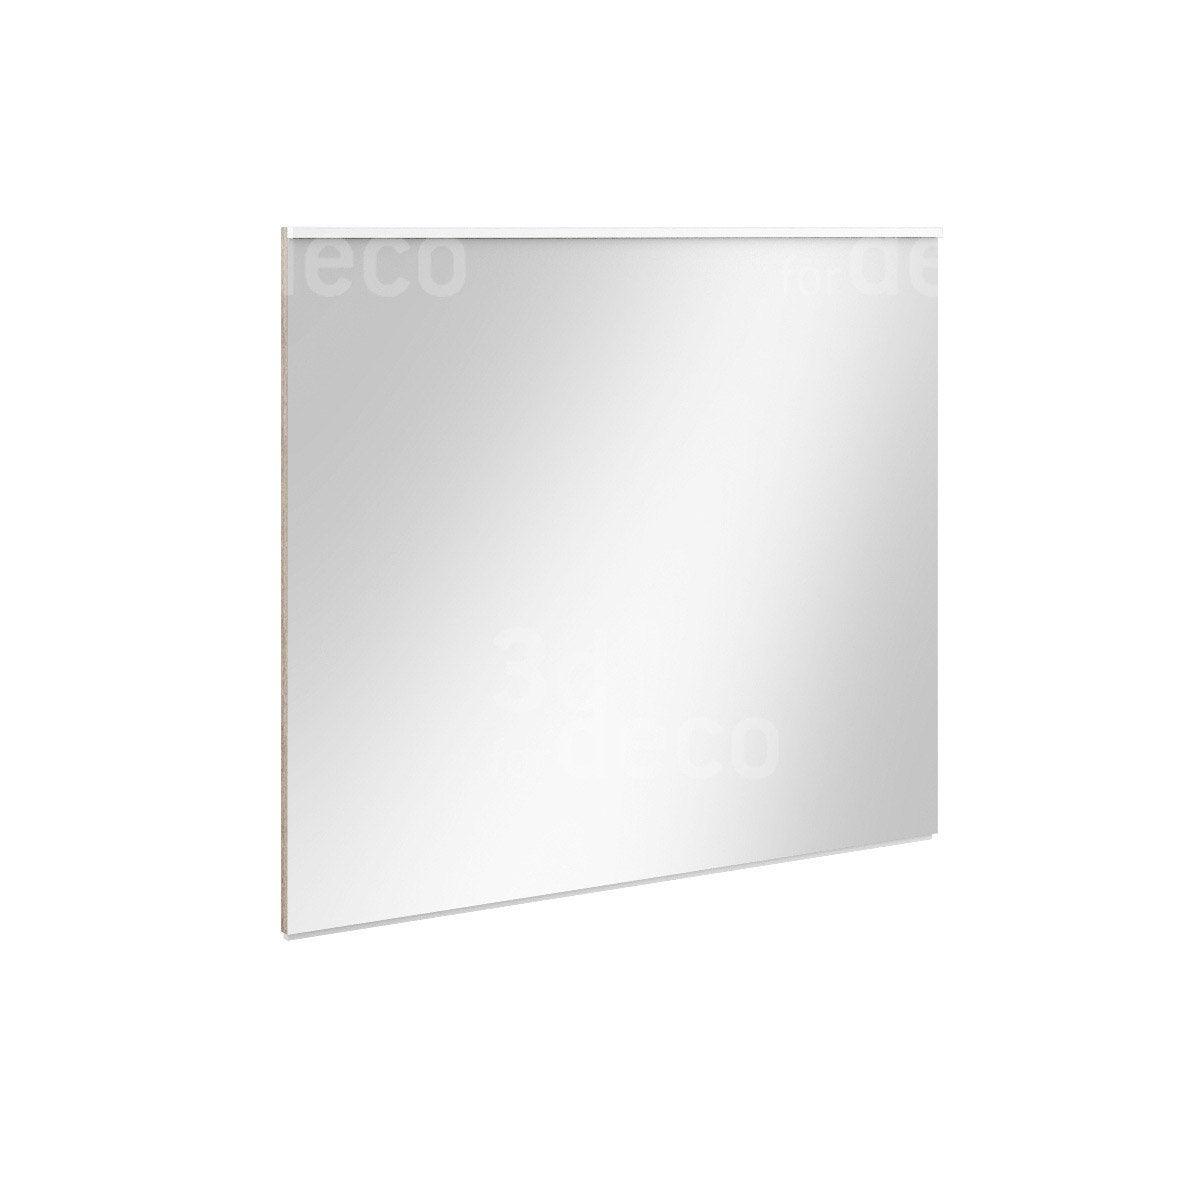 Miroir avec clairage int gr l 120 cm eden leroy merlin - Miroir a coller leroy merlin ...